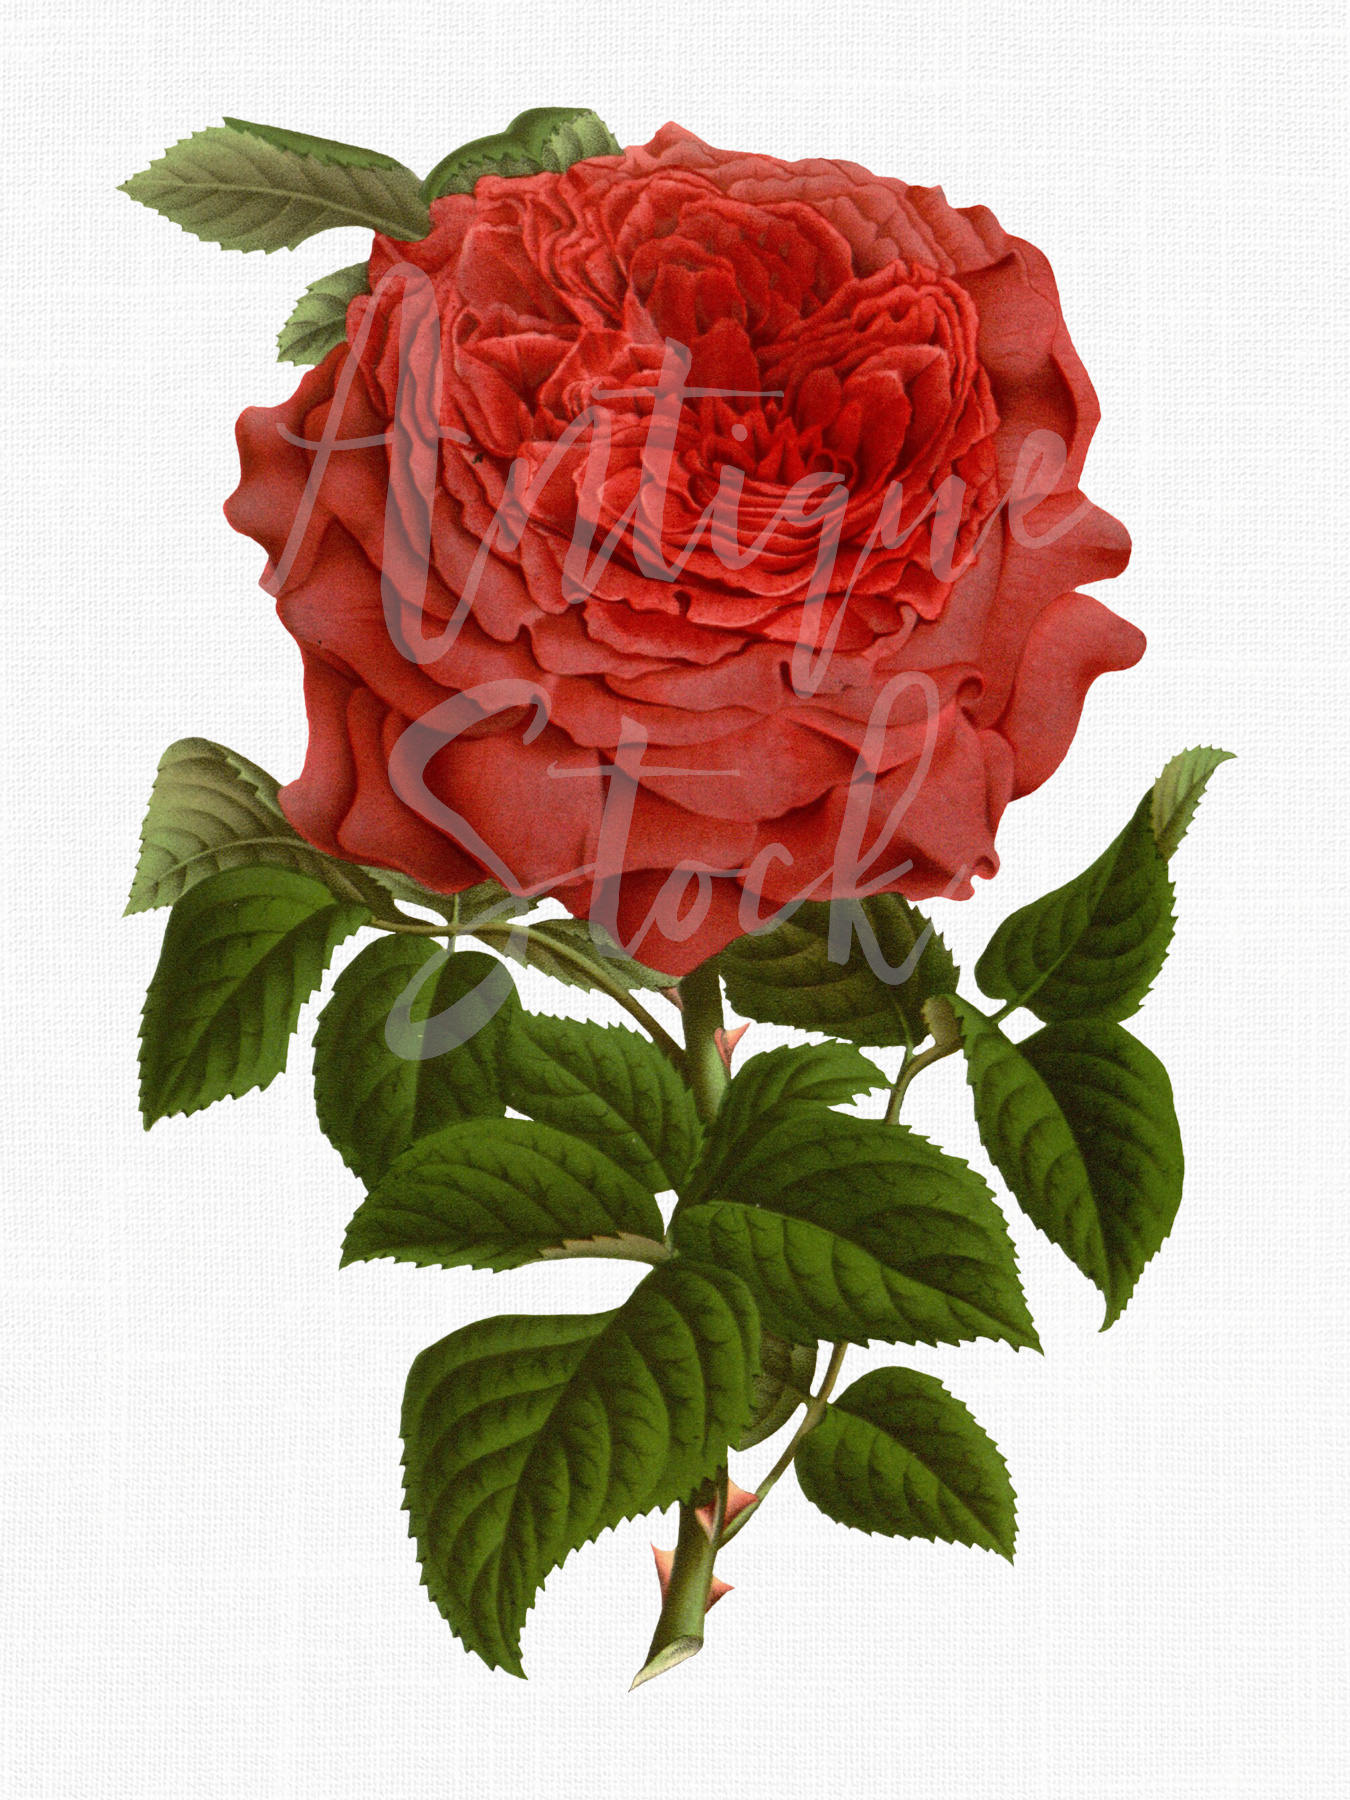 Forum on this topic: Phyllis Love, rosie-perez/